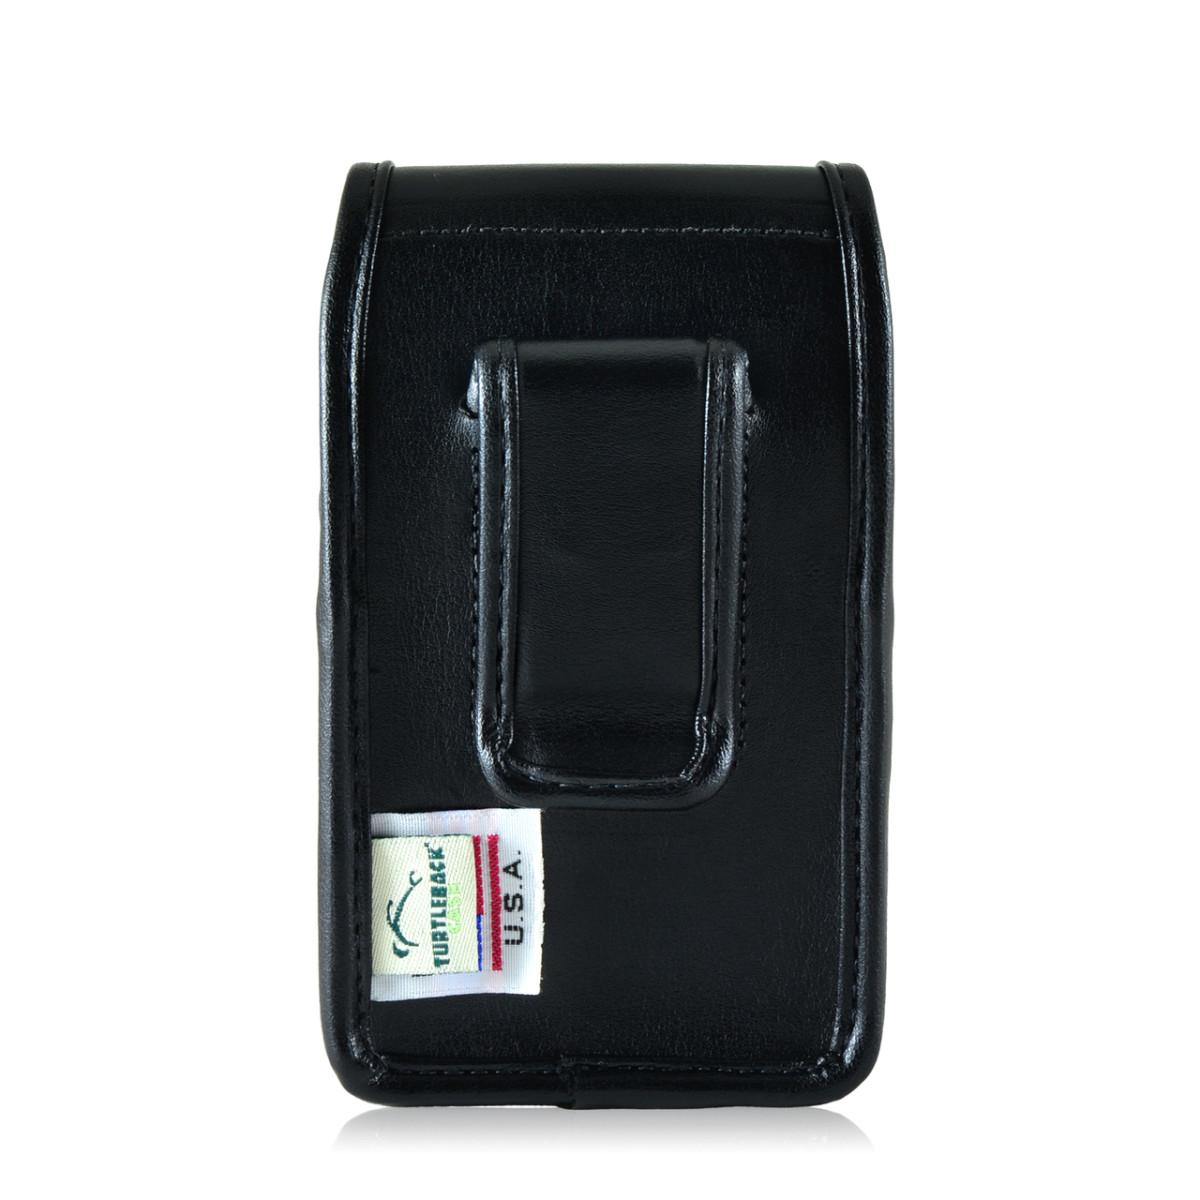 Blackberry Q10 9900 9600 Leather Holster Black Belt Clip